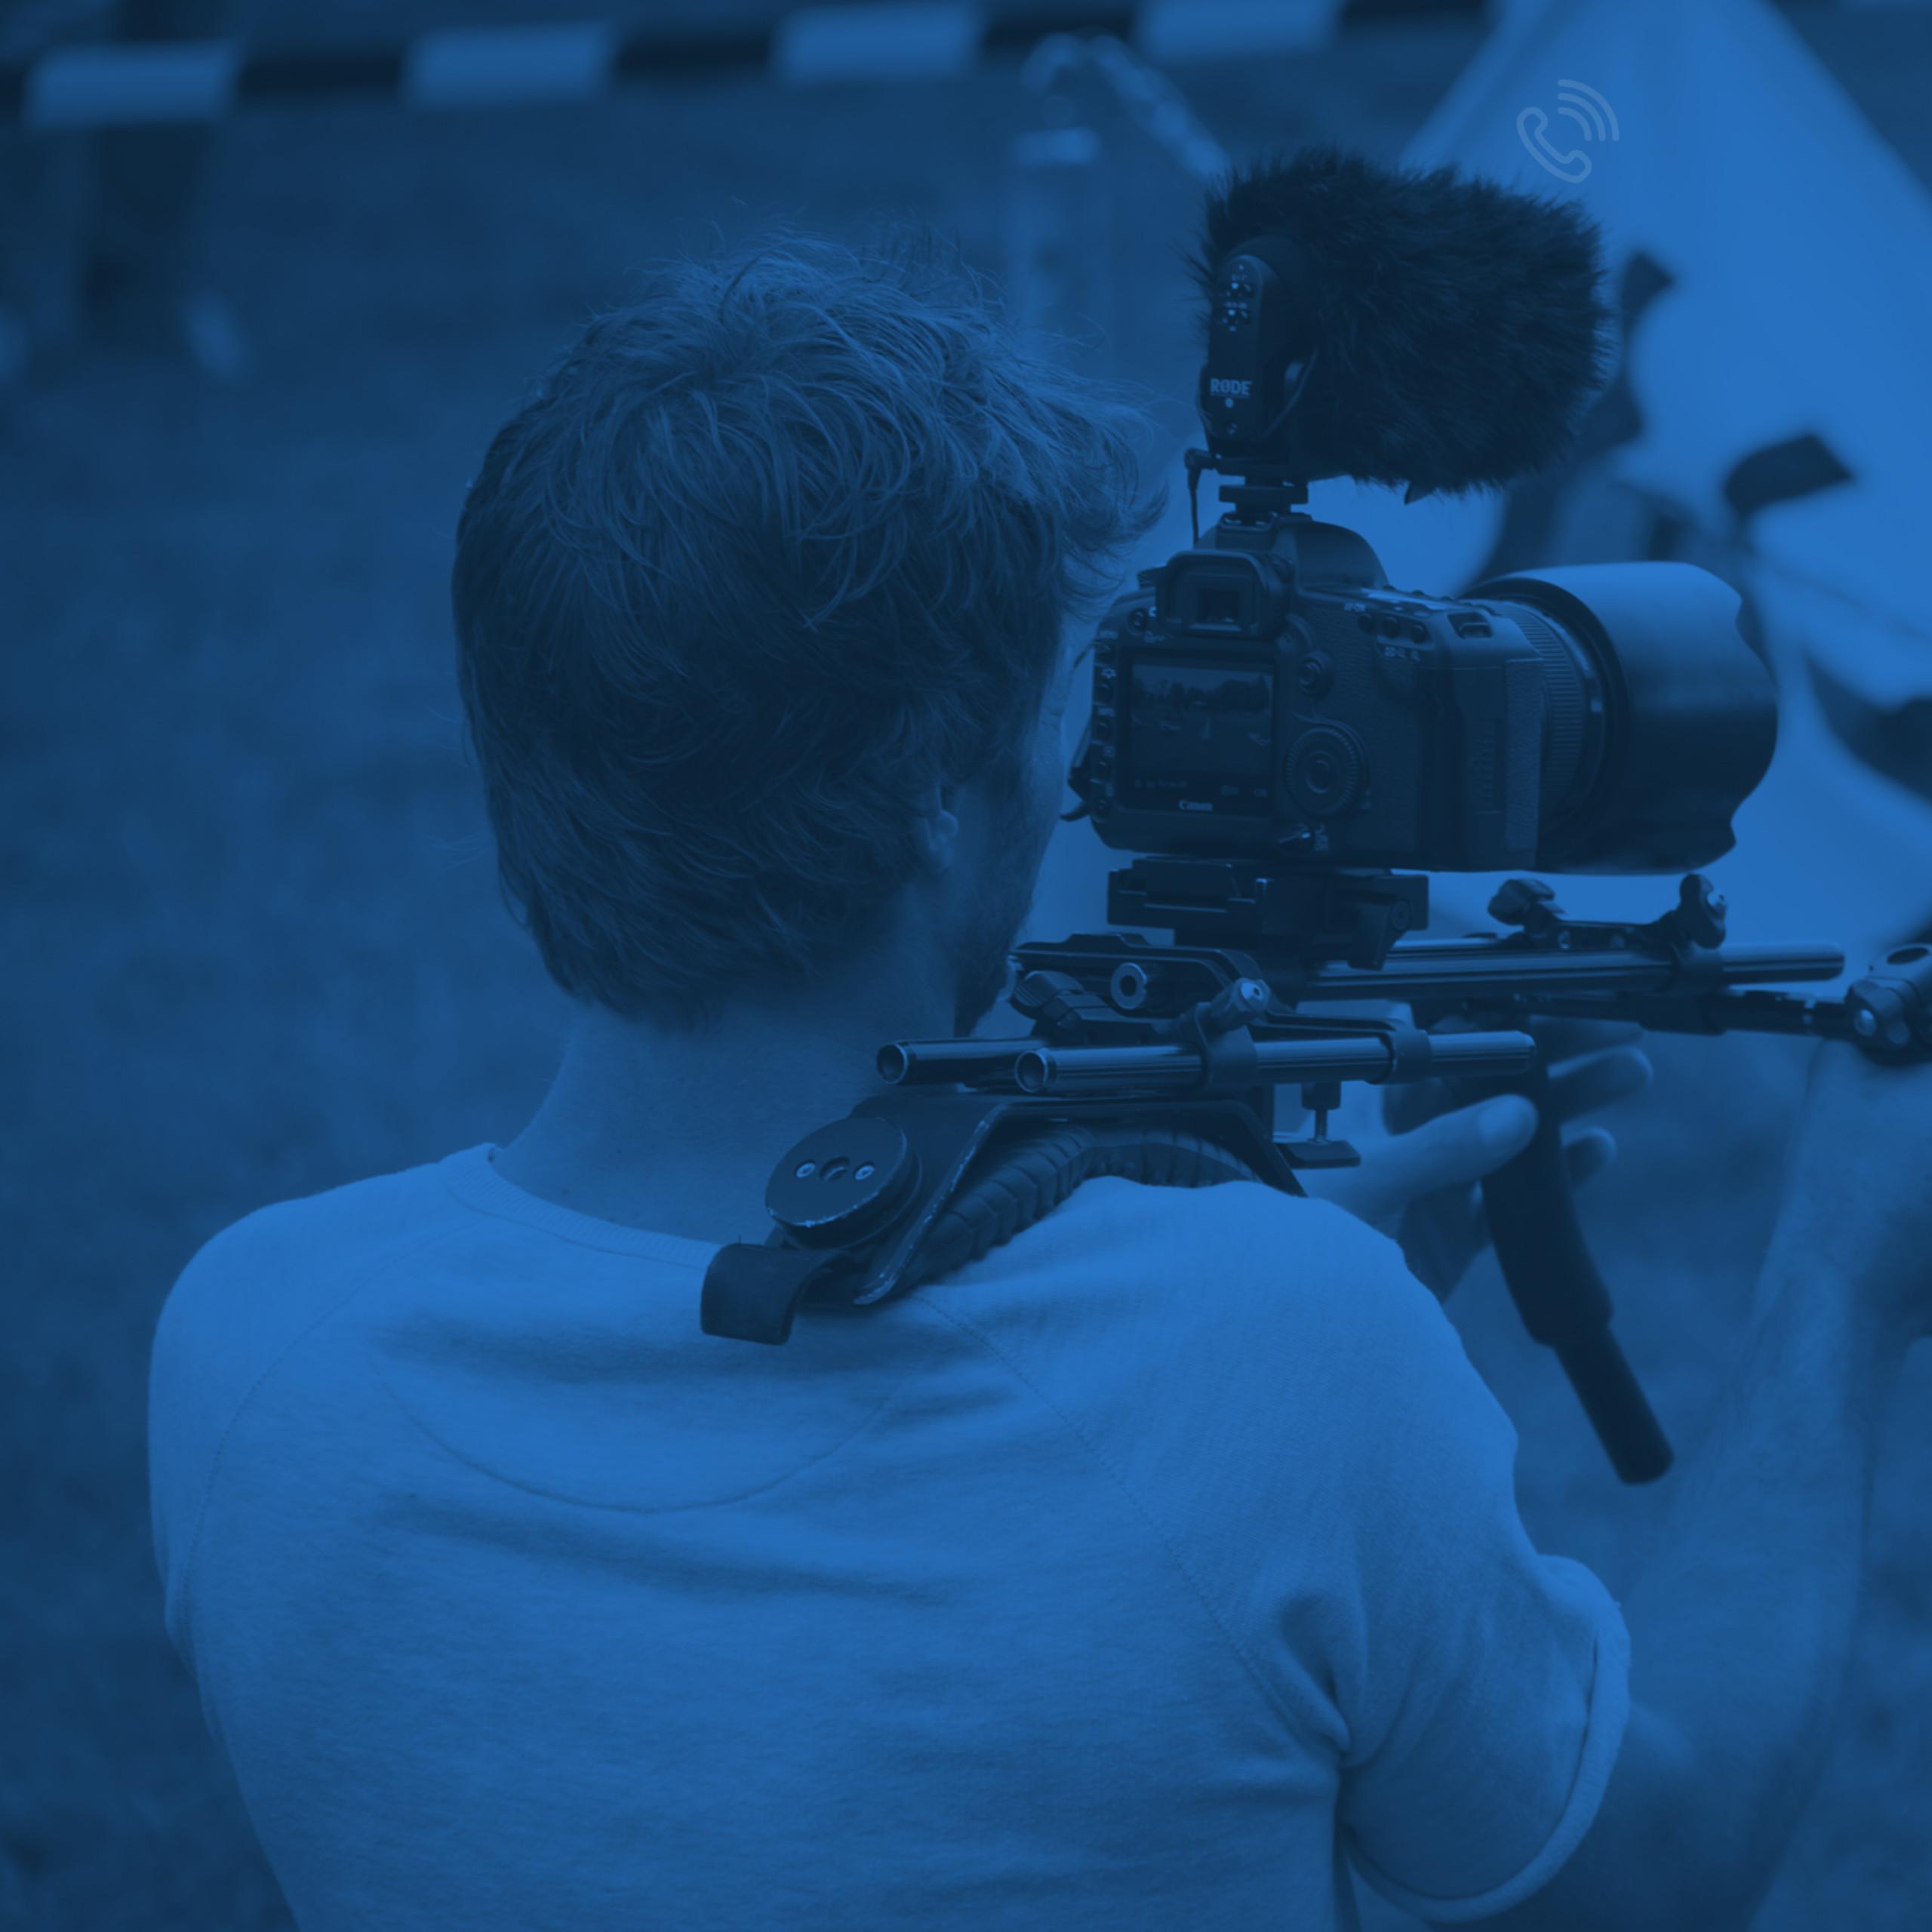 Video/ Film Production Consultation